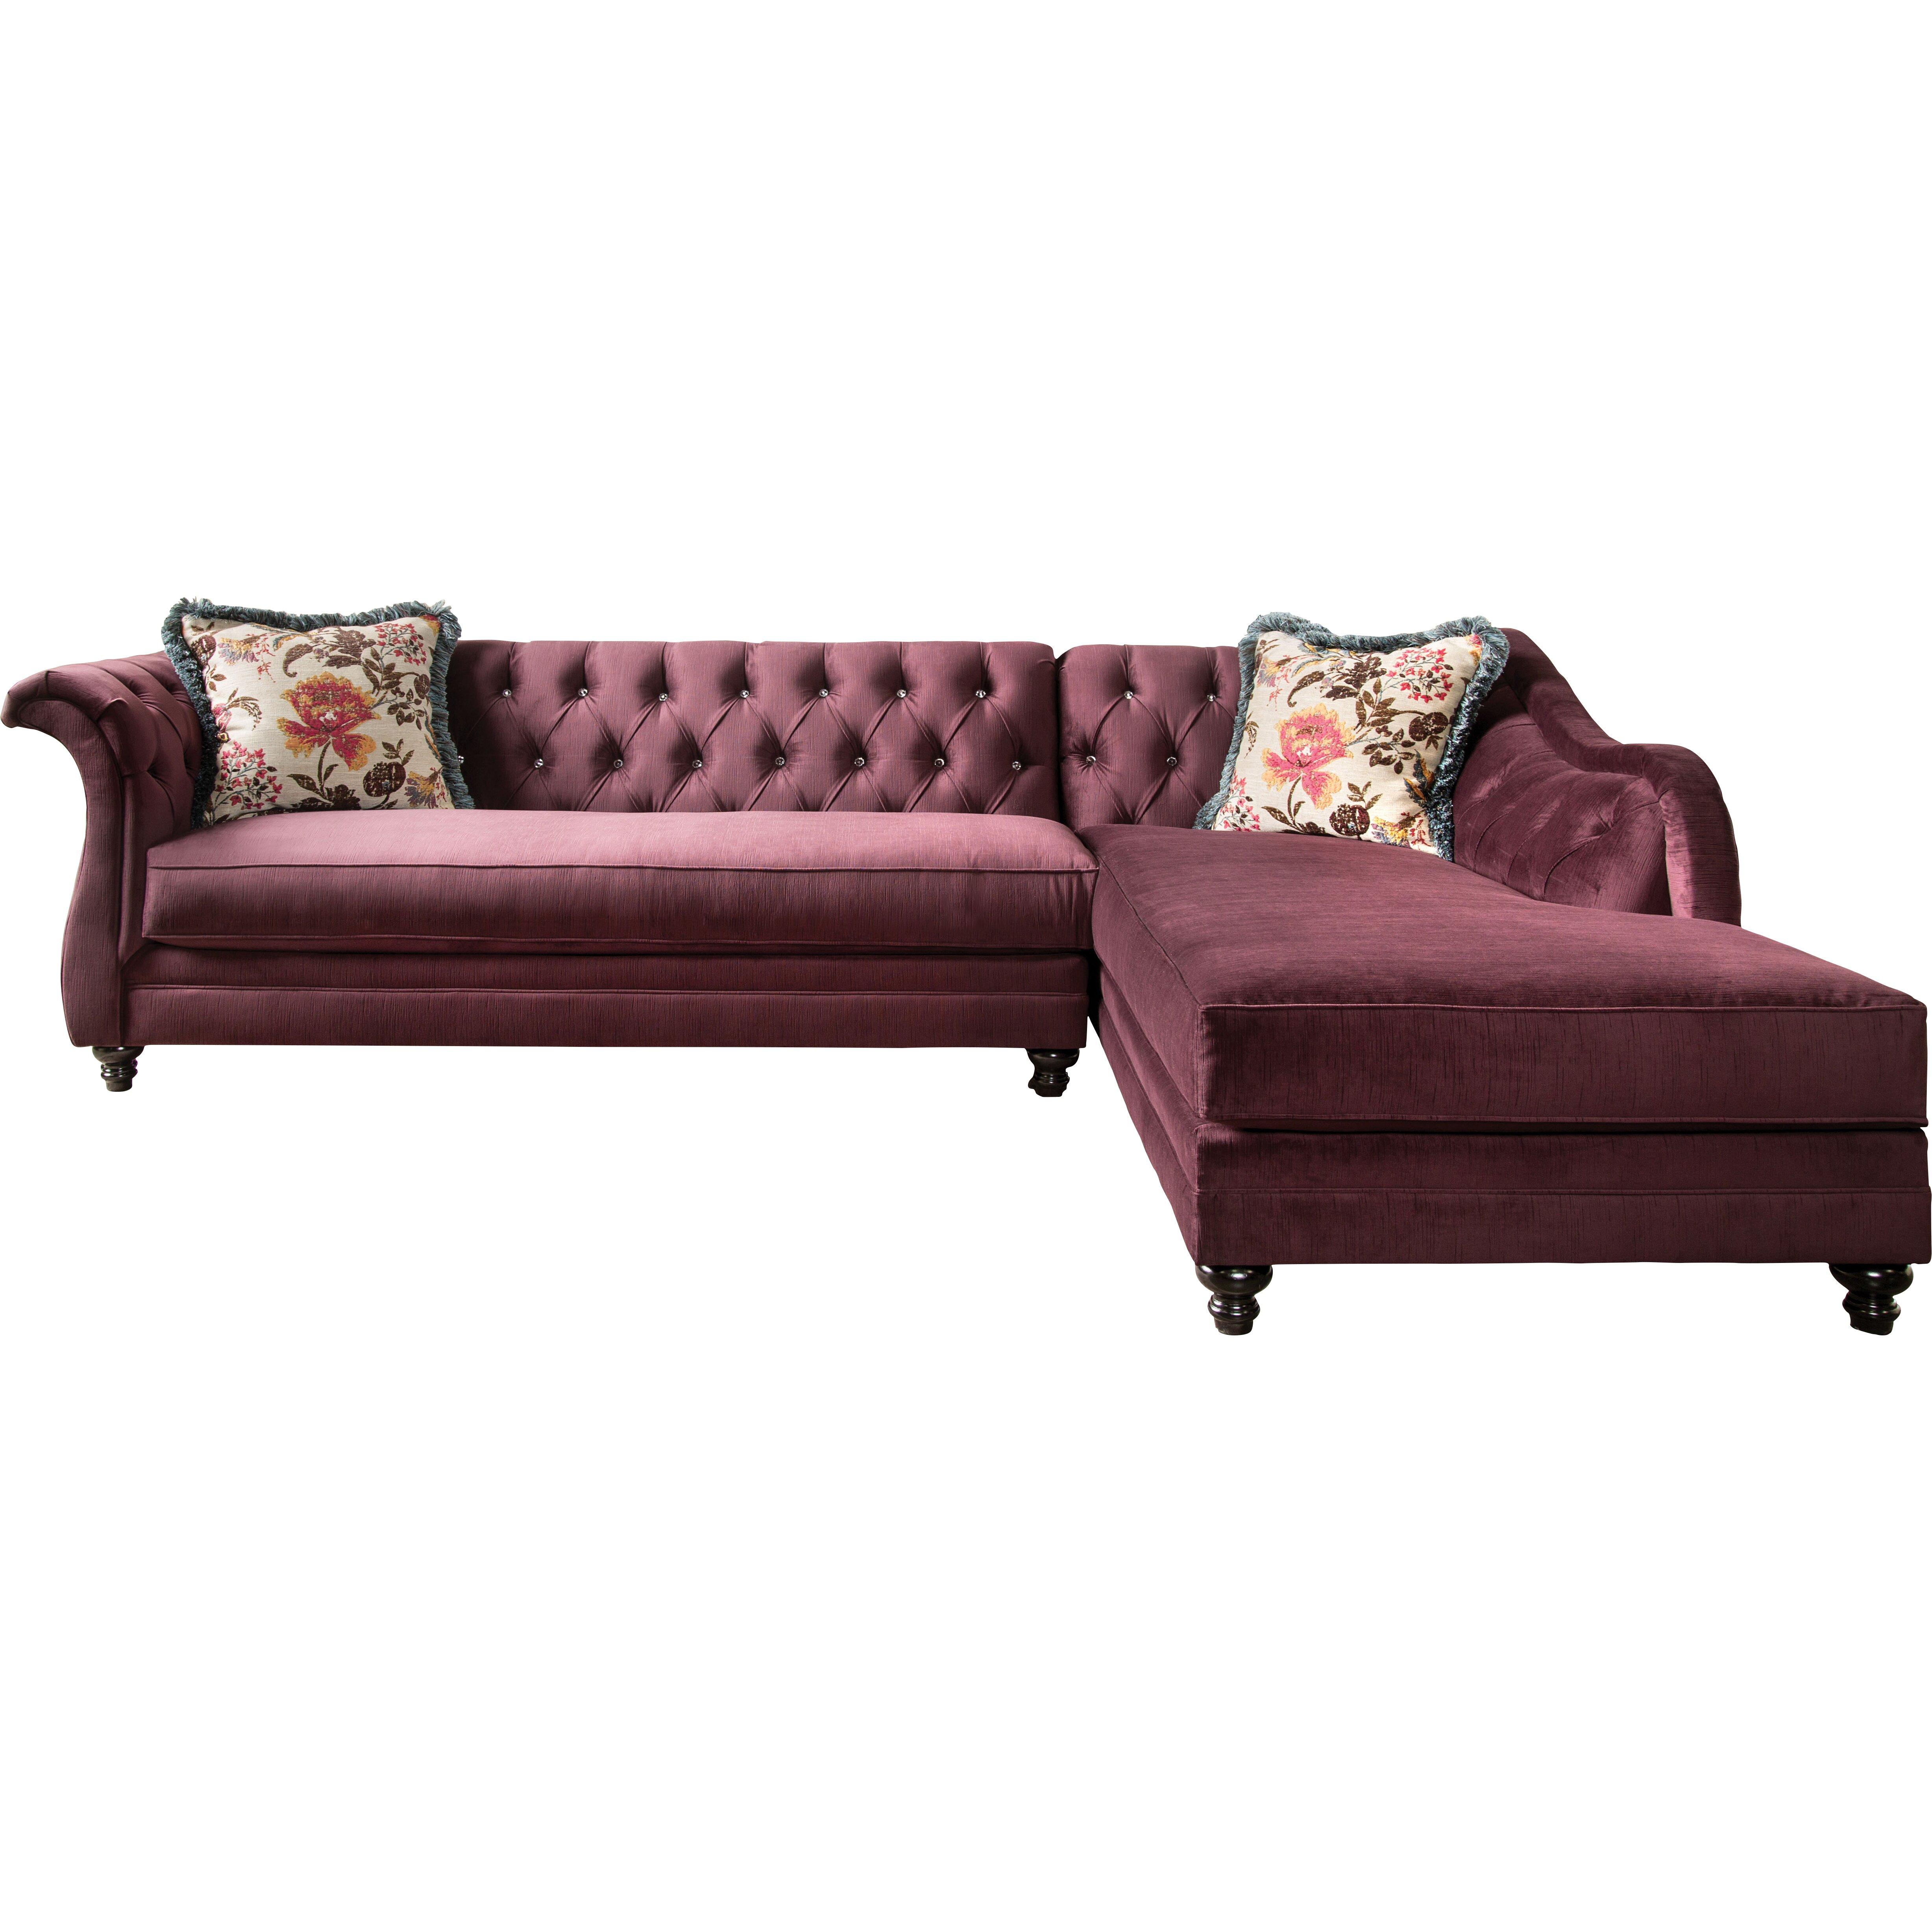 Hokku designs hartmann sectional reviews for Hokku designs living room furniture